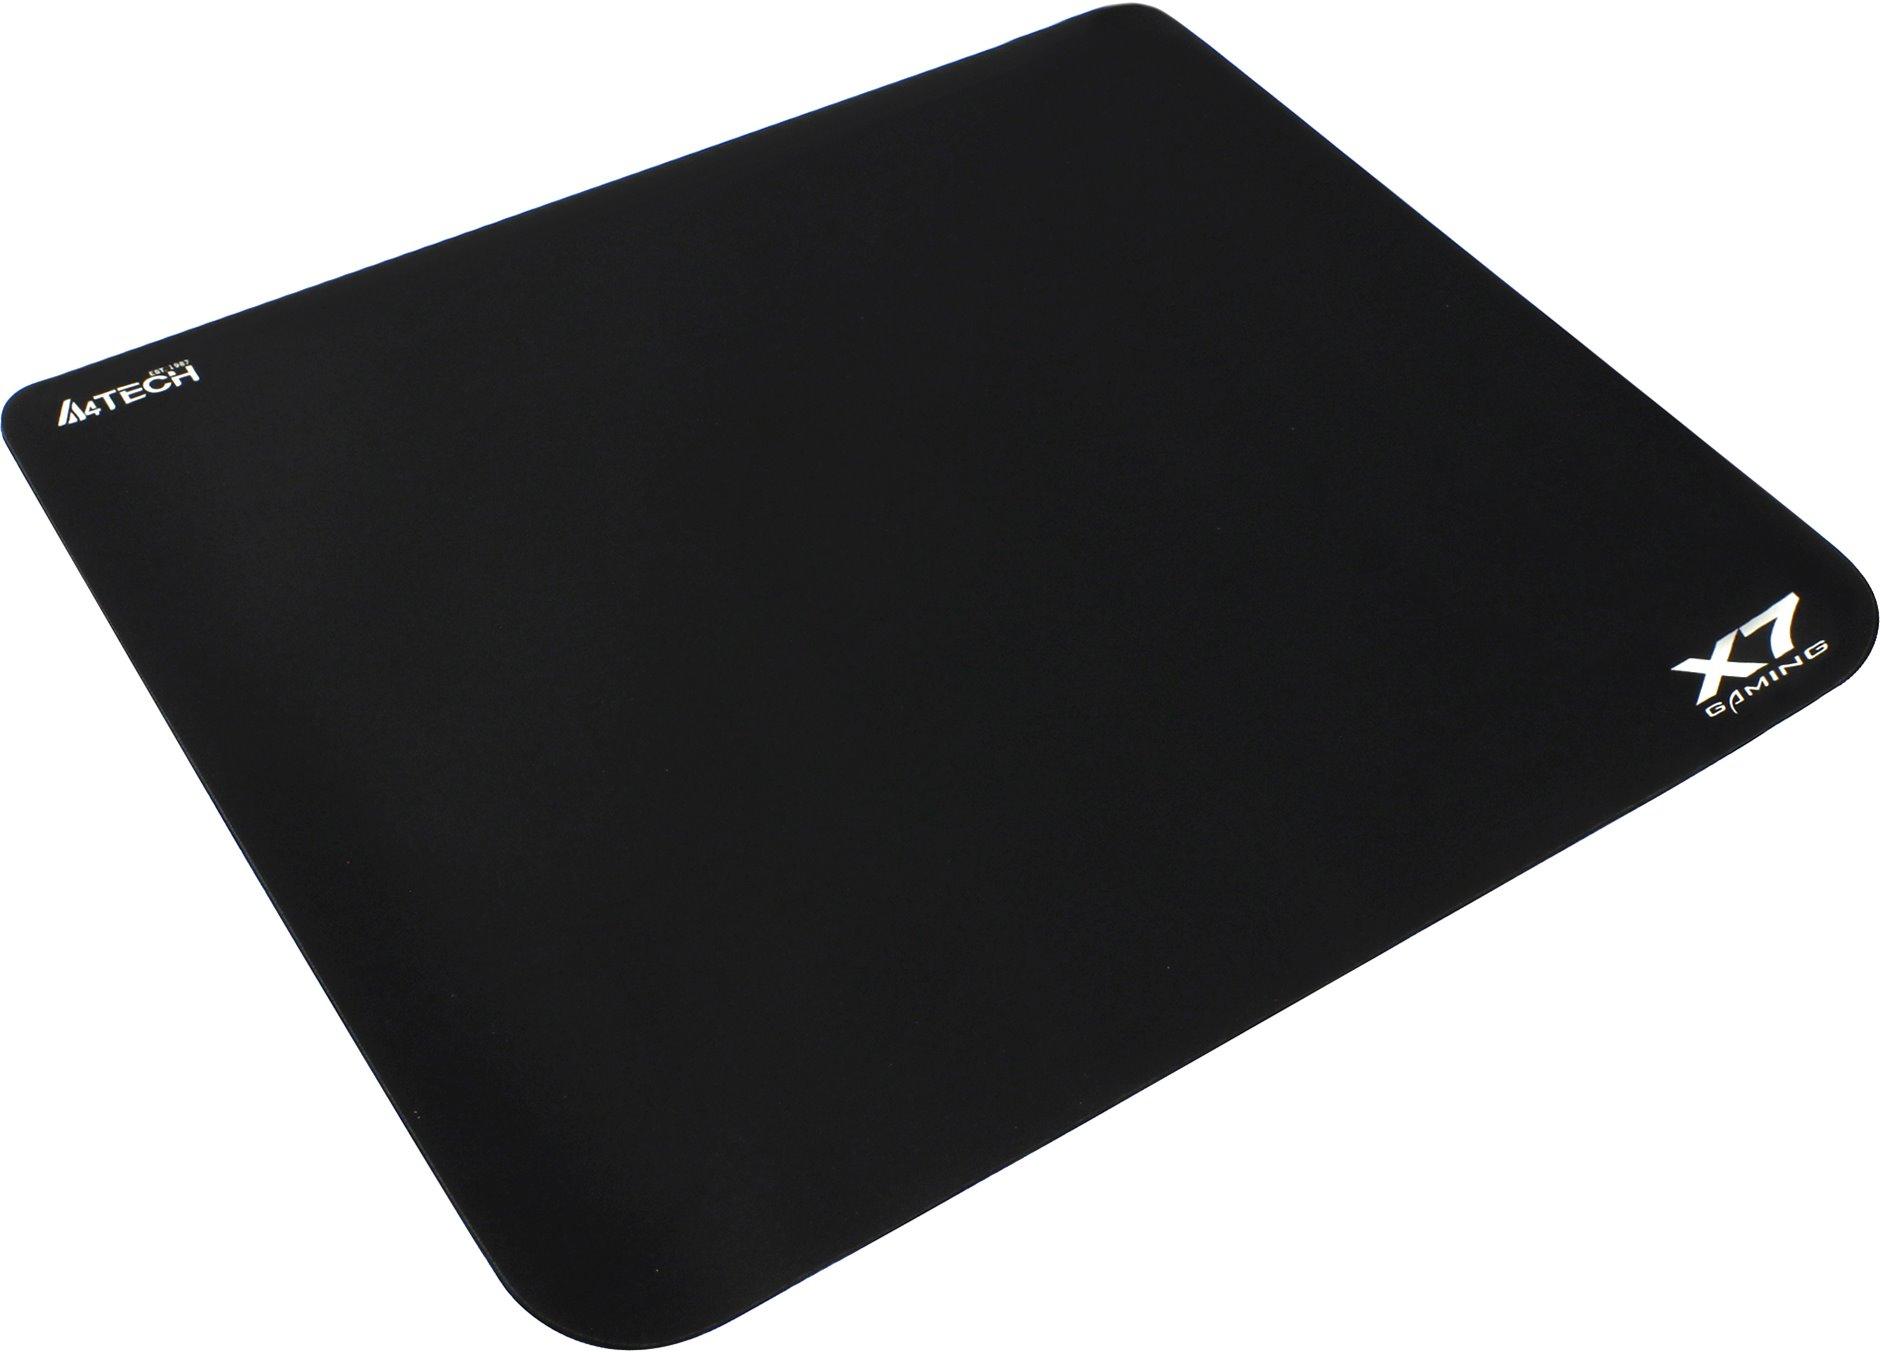 Коврик для мыши A4Tech X7-500MP, 437x400x3mm, черный